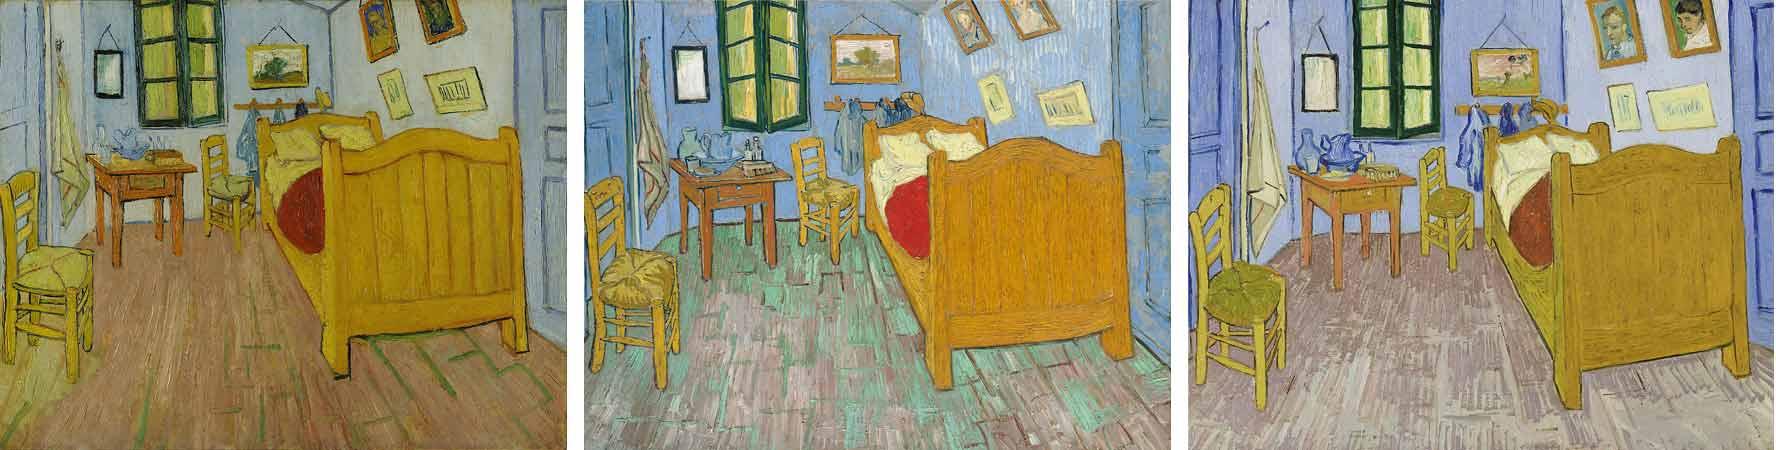 1-Van-Gogh-Bedroom-All-three